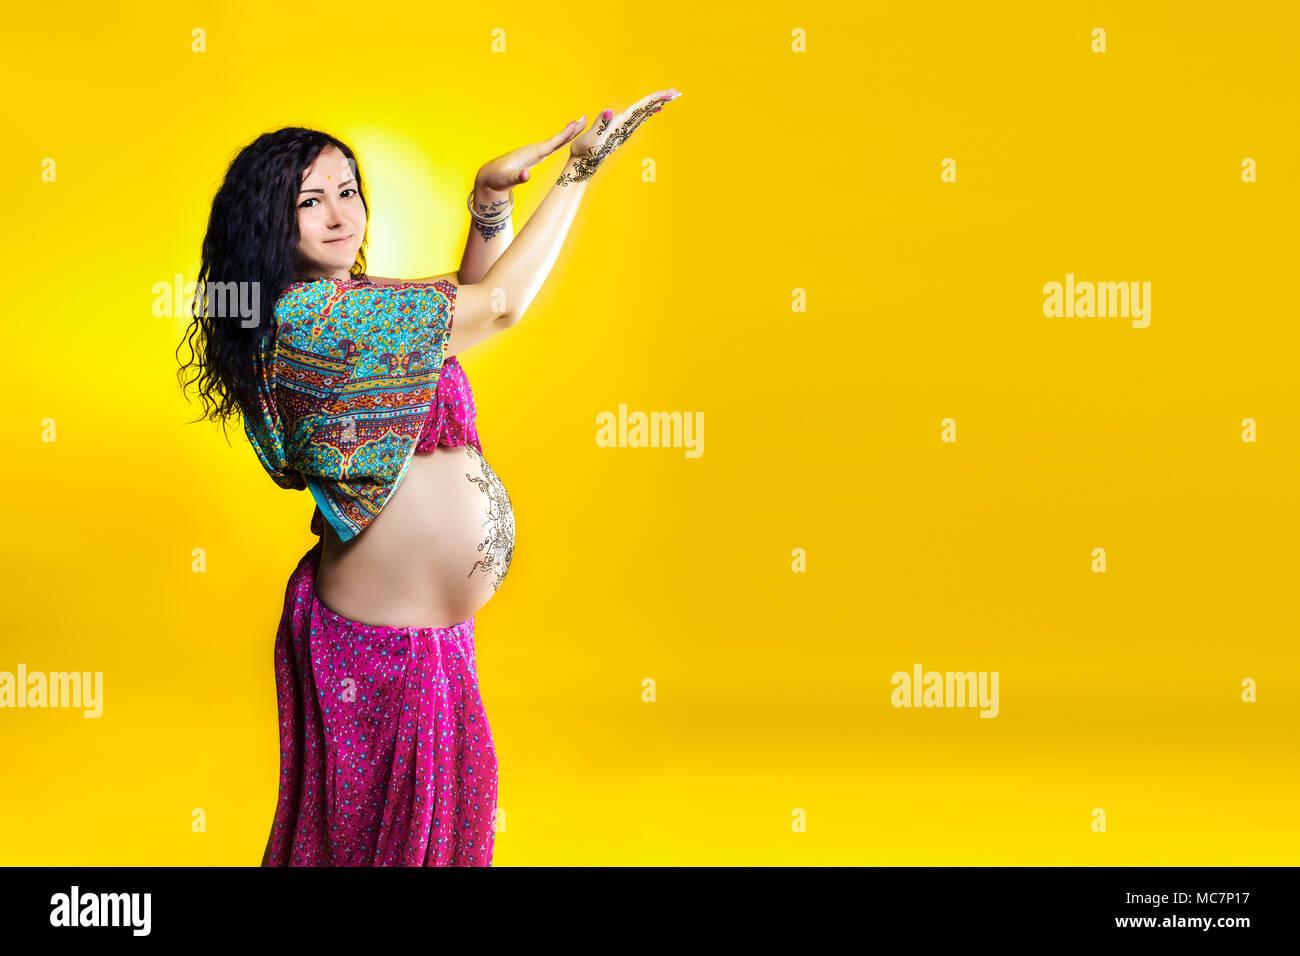 Black Henna Tattoo While Pregnant: Pregnant Happy Woman In Indian Sari With Mehendi Tattoo